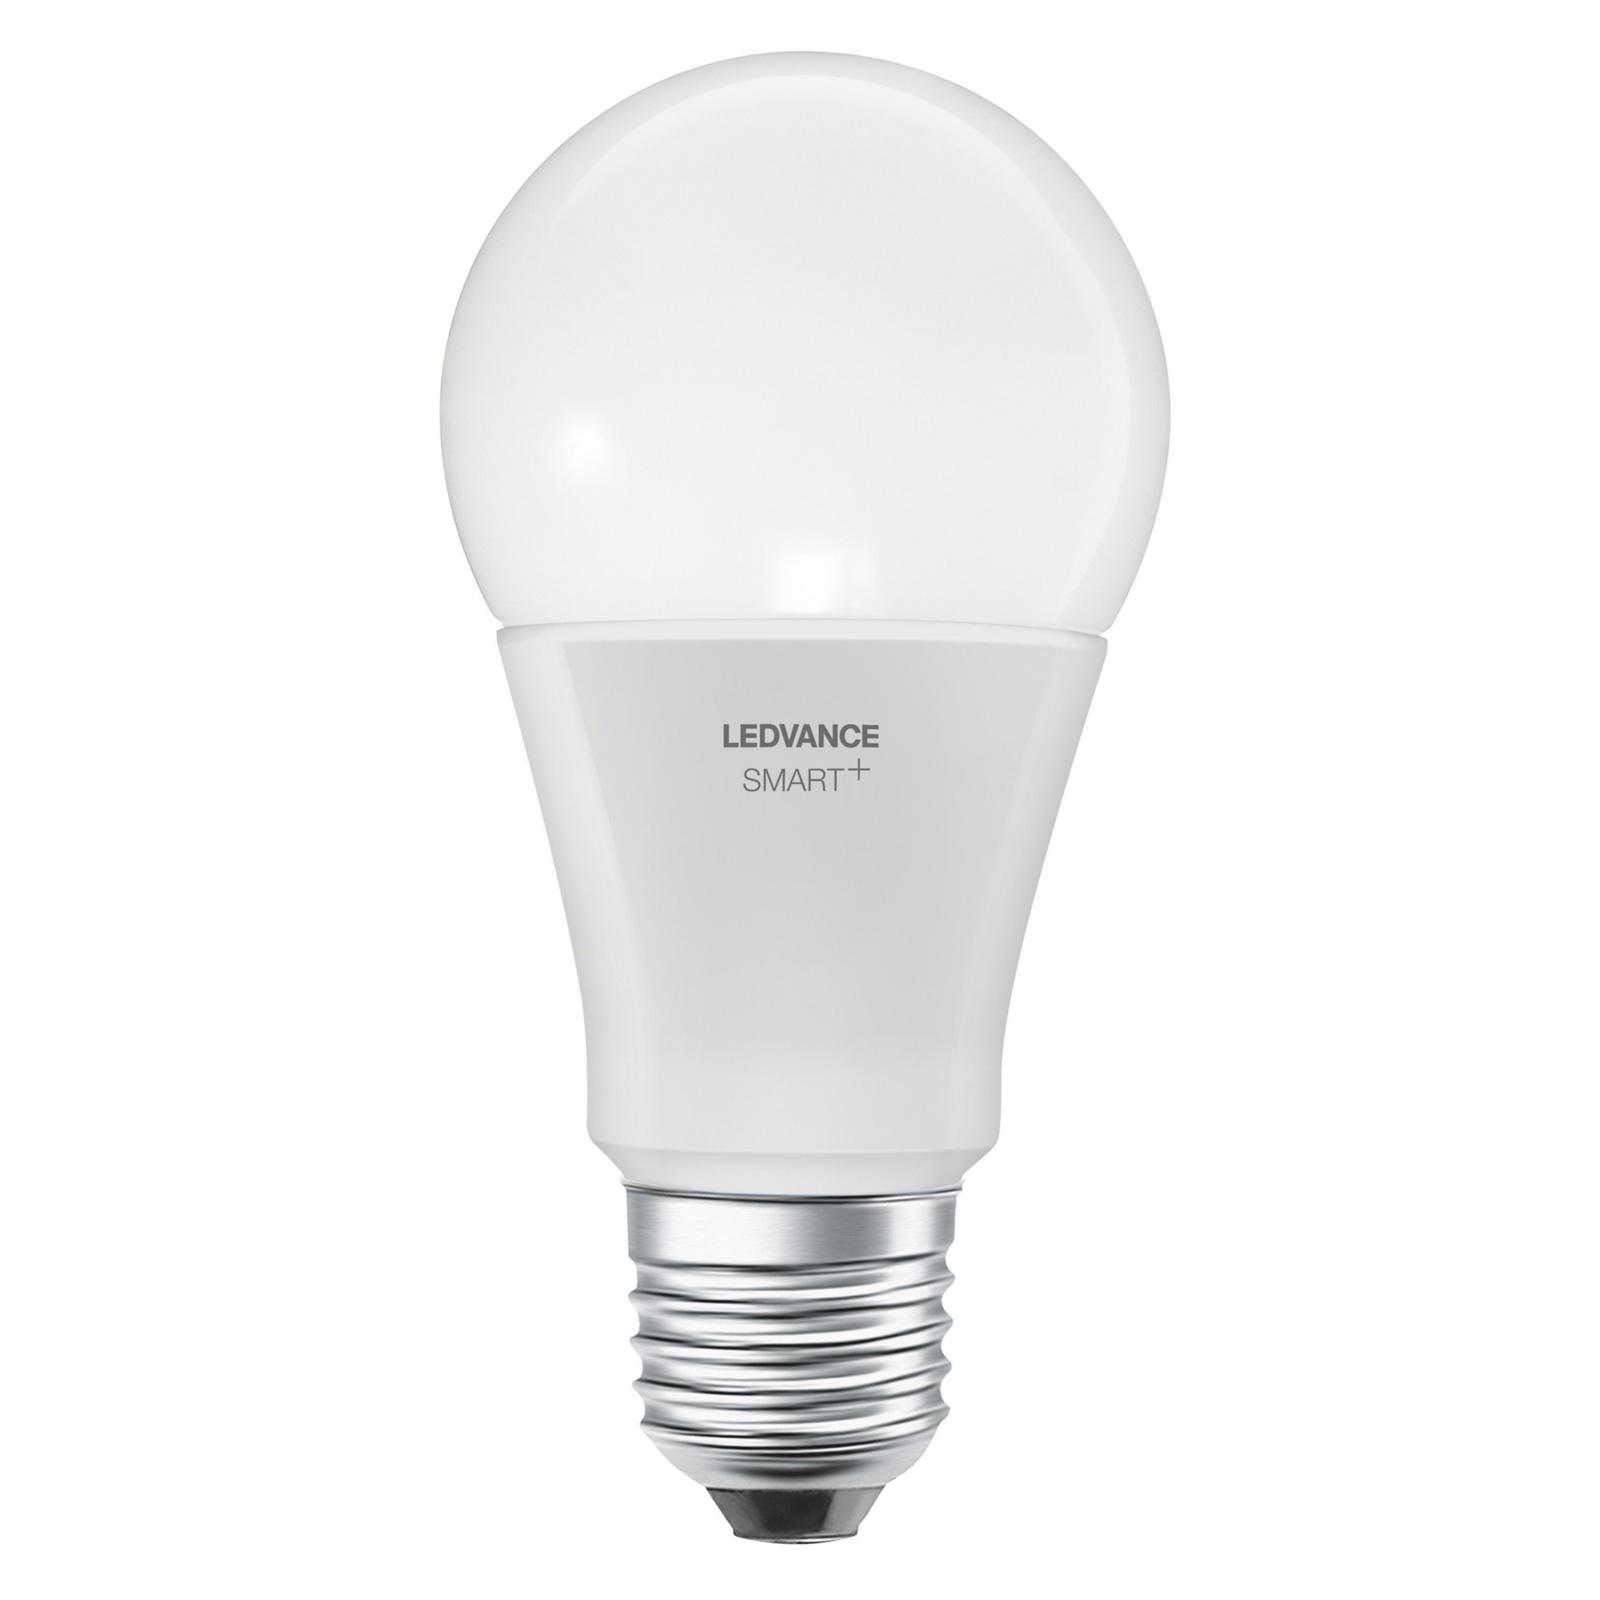 LEDVANCE SMART+ Bluetooth E27 Classic 9W 2.700 K